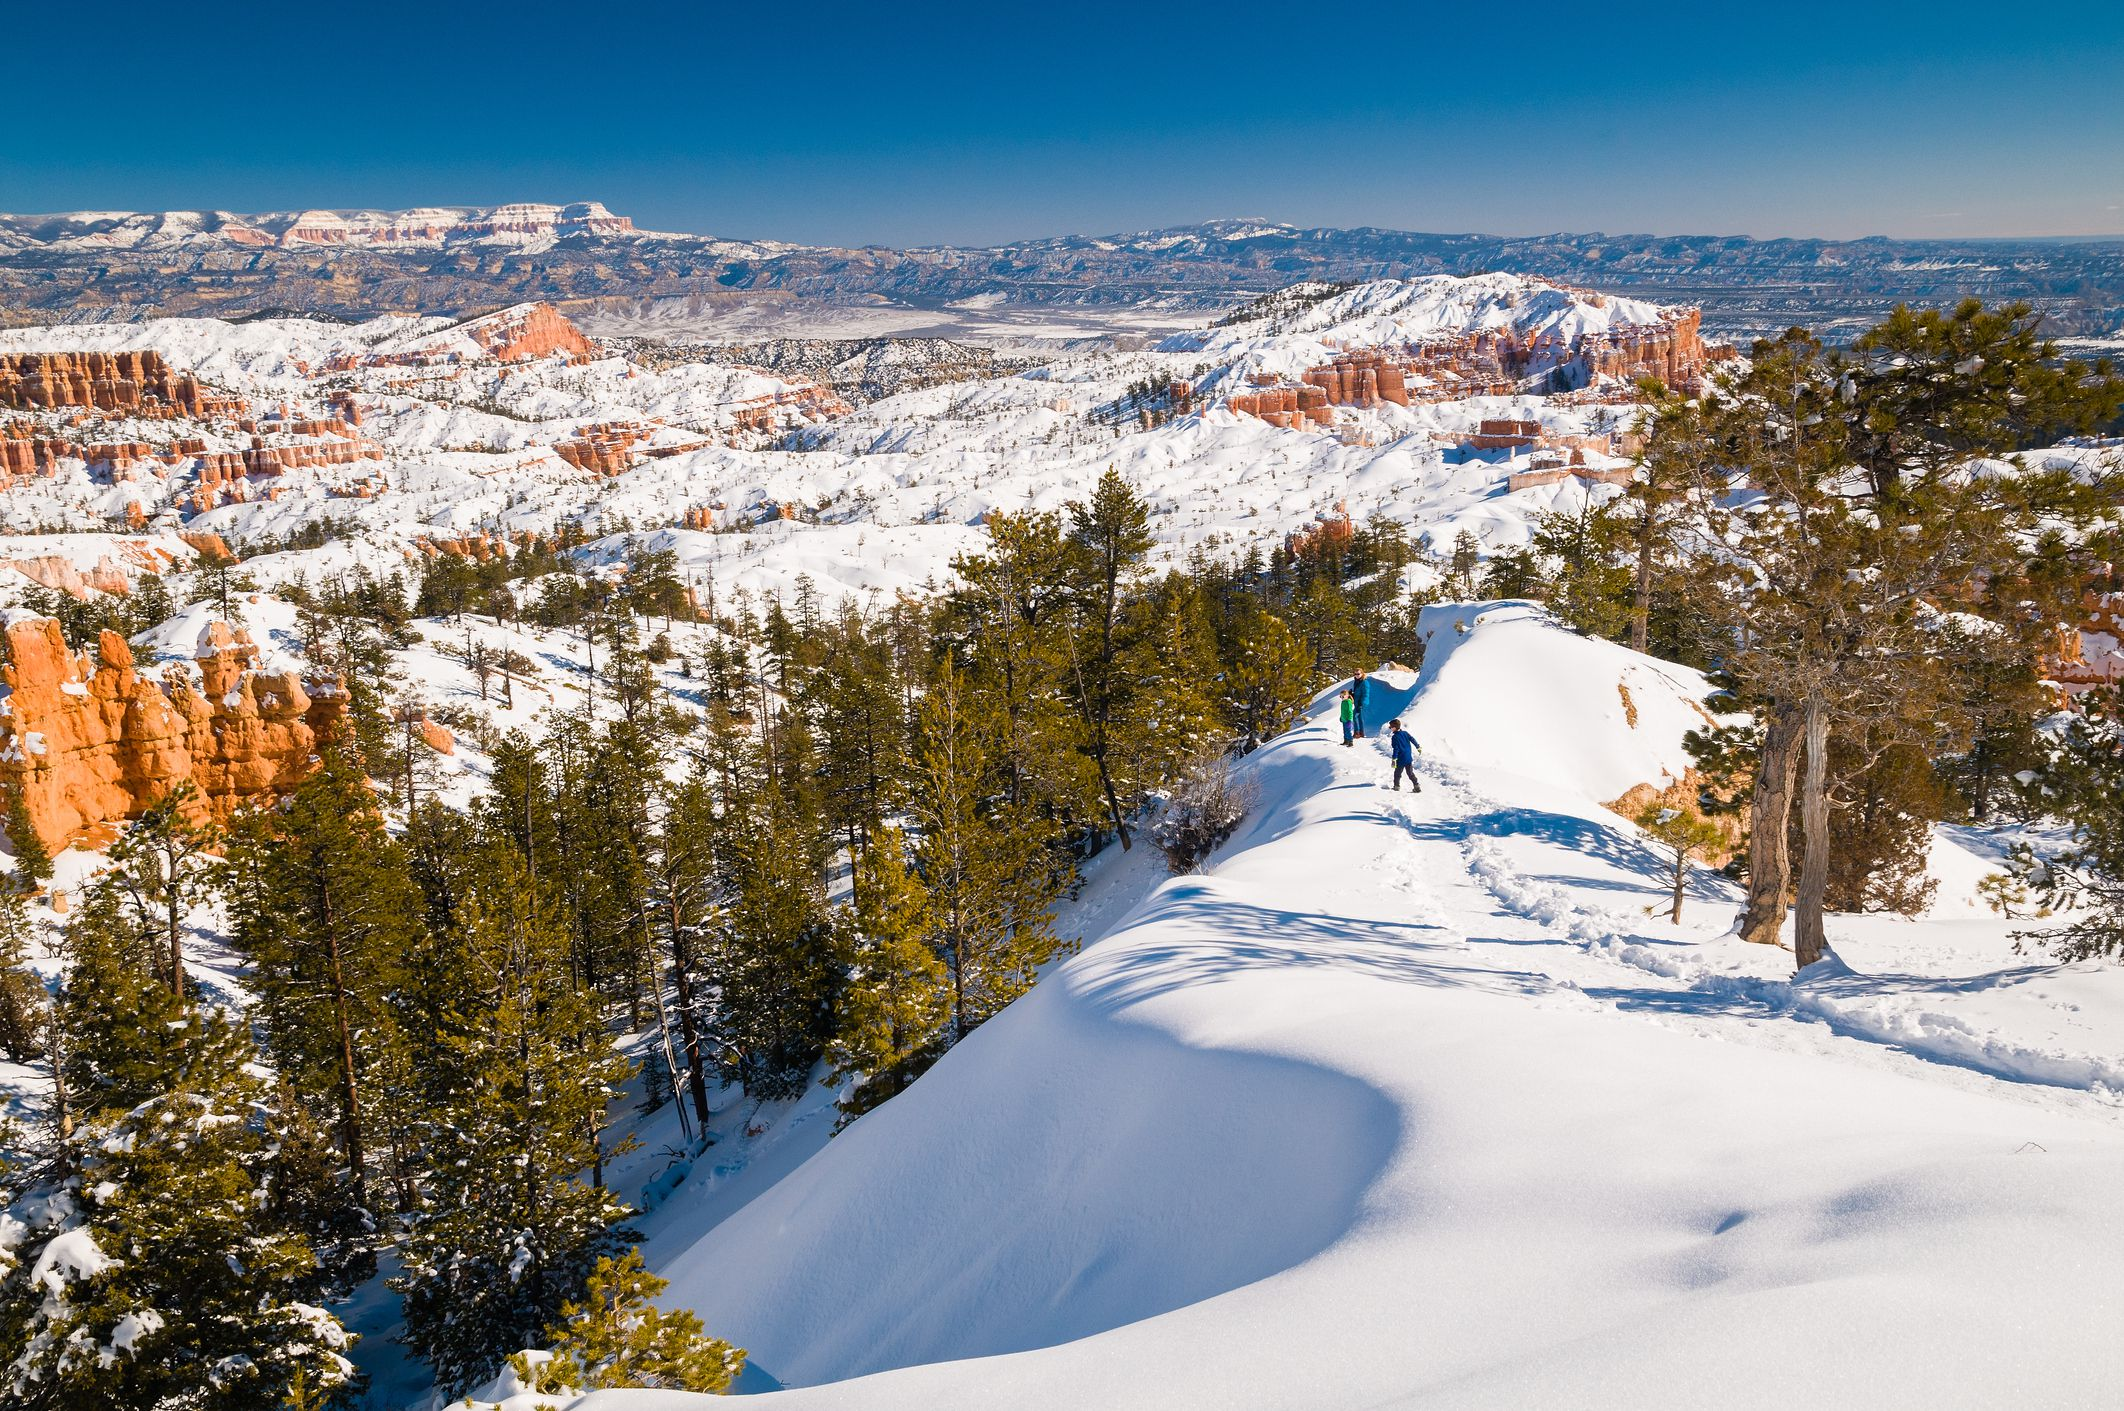 The Best Winter Getaways for Families